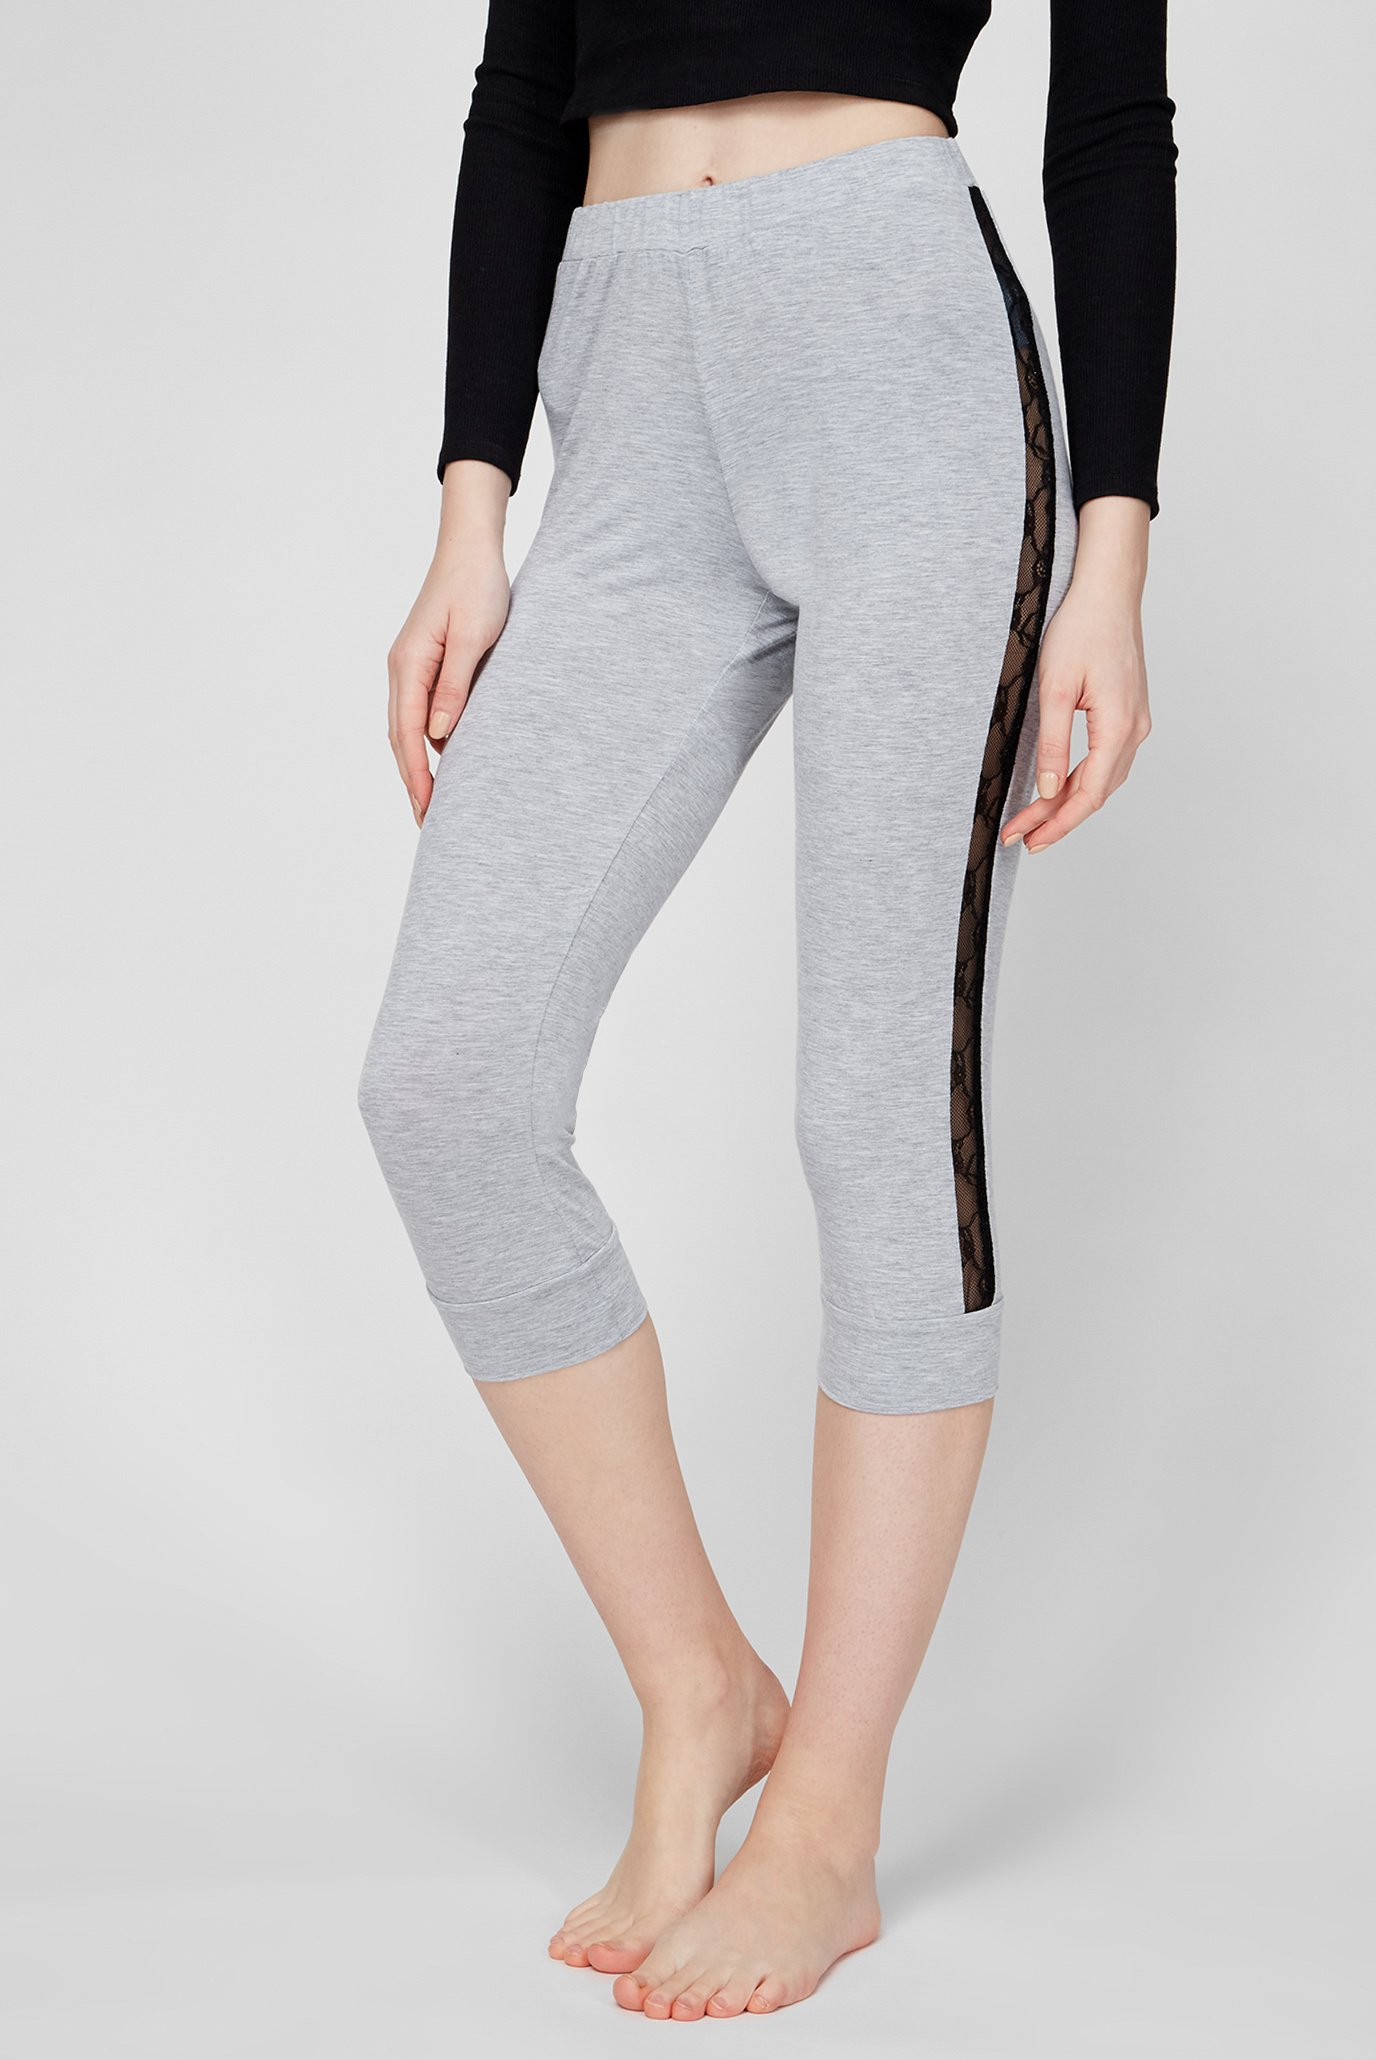 Жіночі сірі штани 1